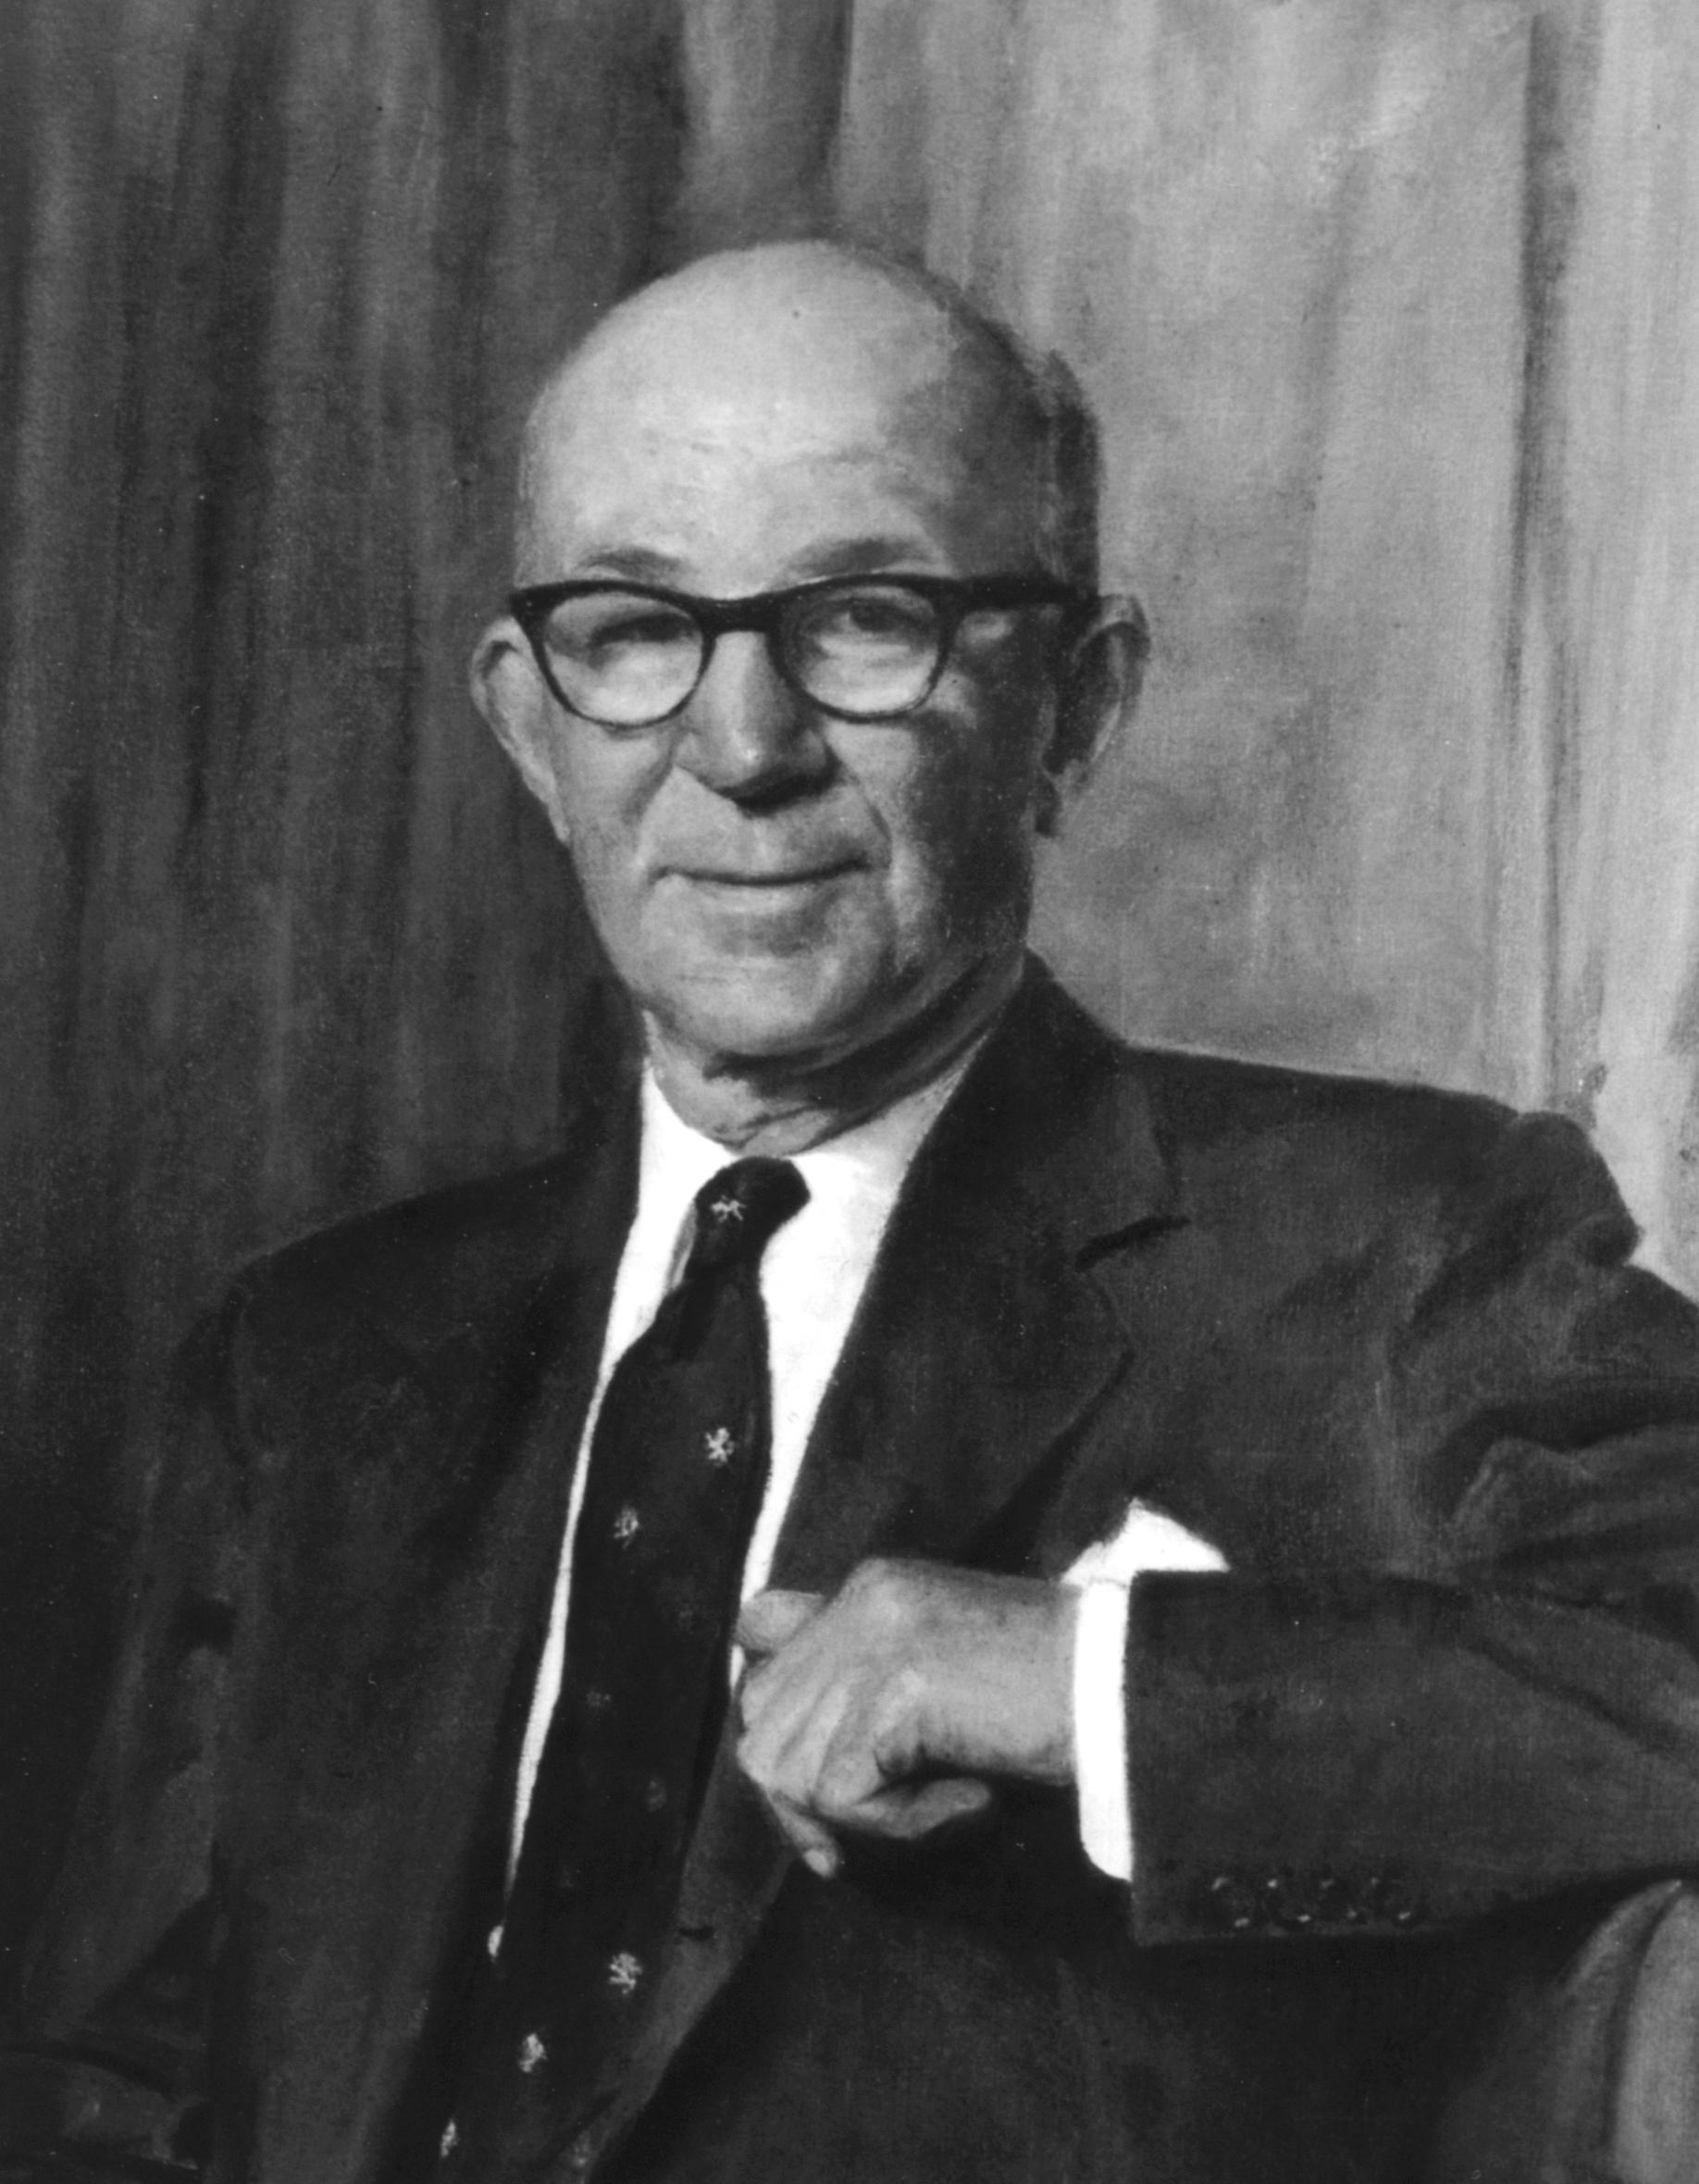 Professor Sir Robert Macintosh